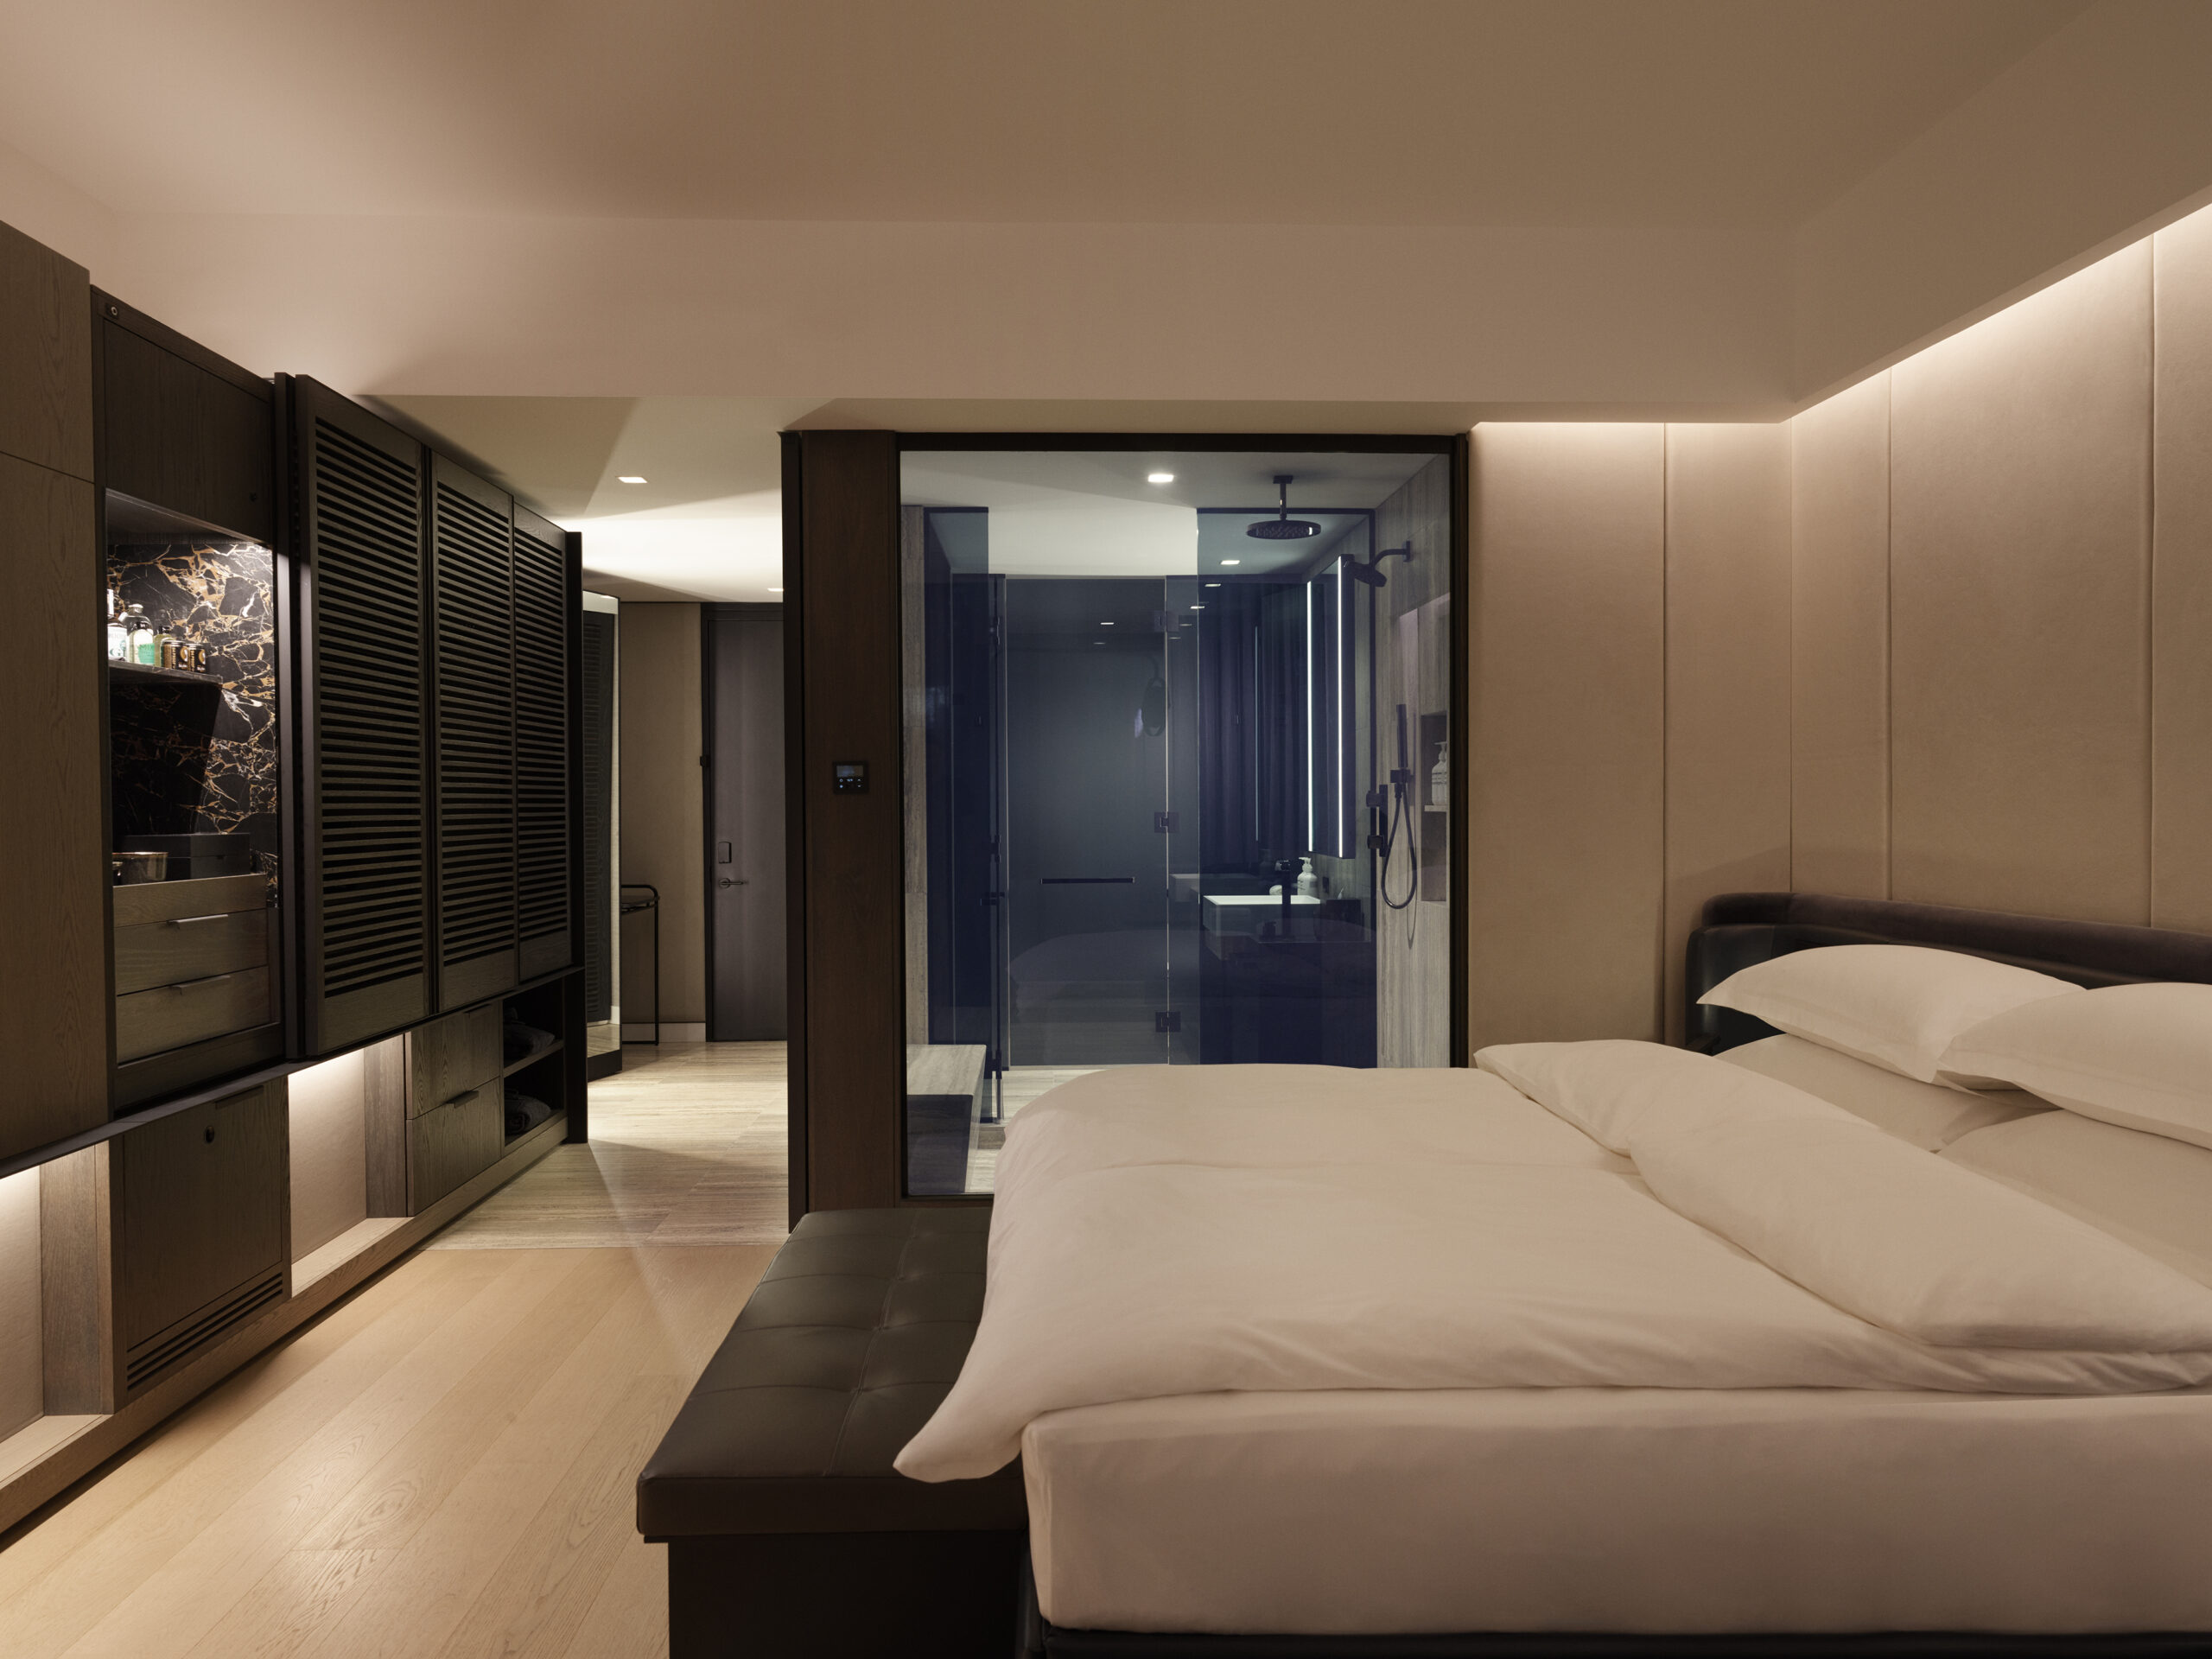 DeluxeKing-Room-scaled